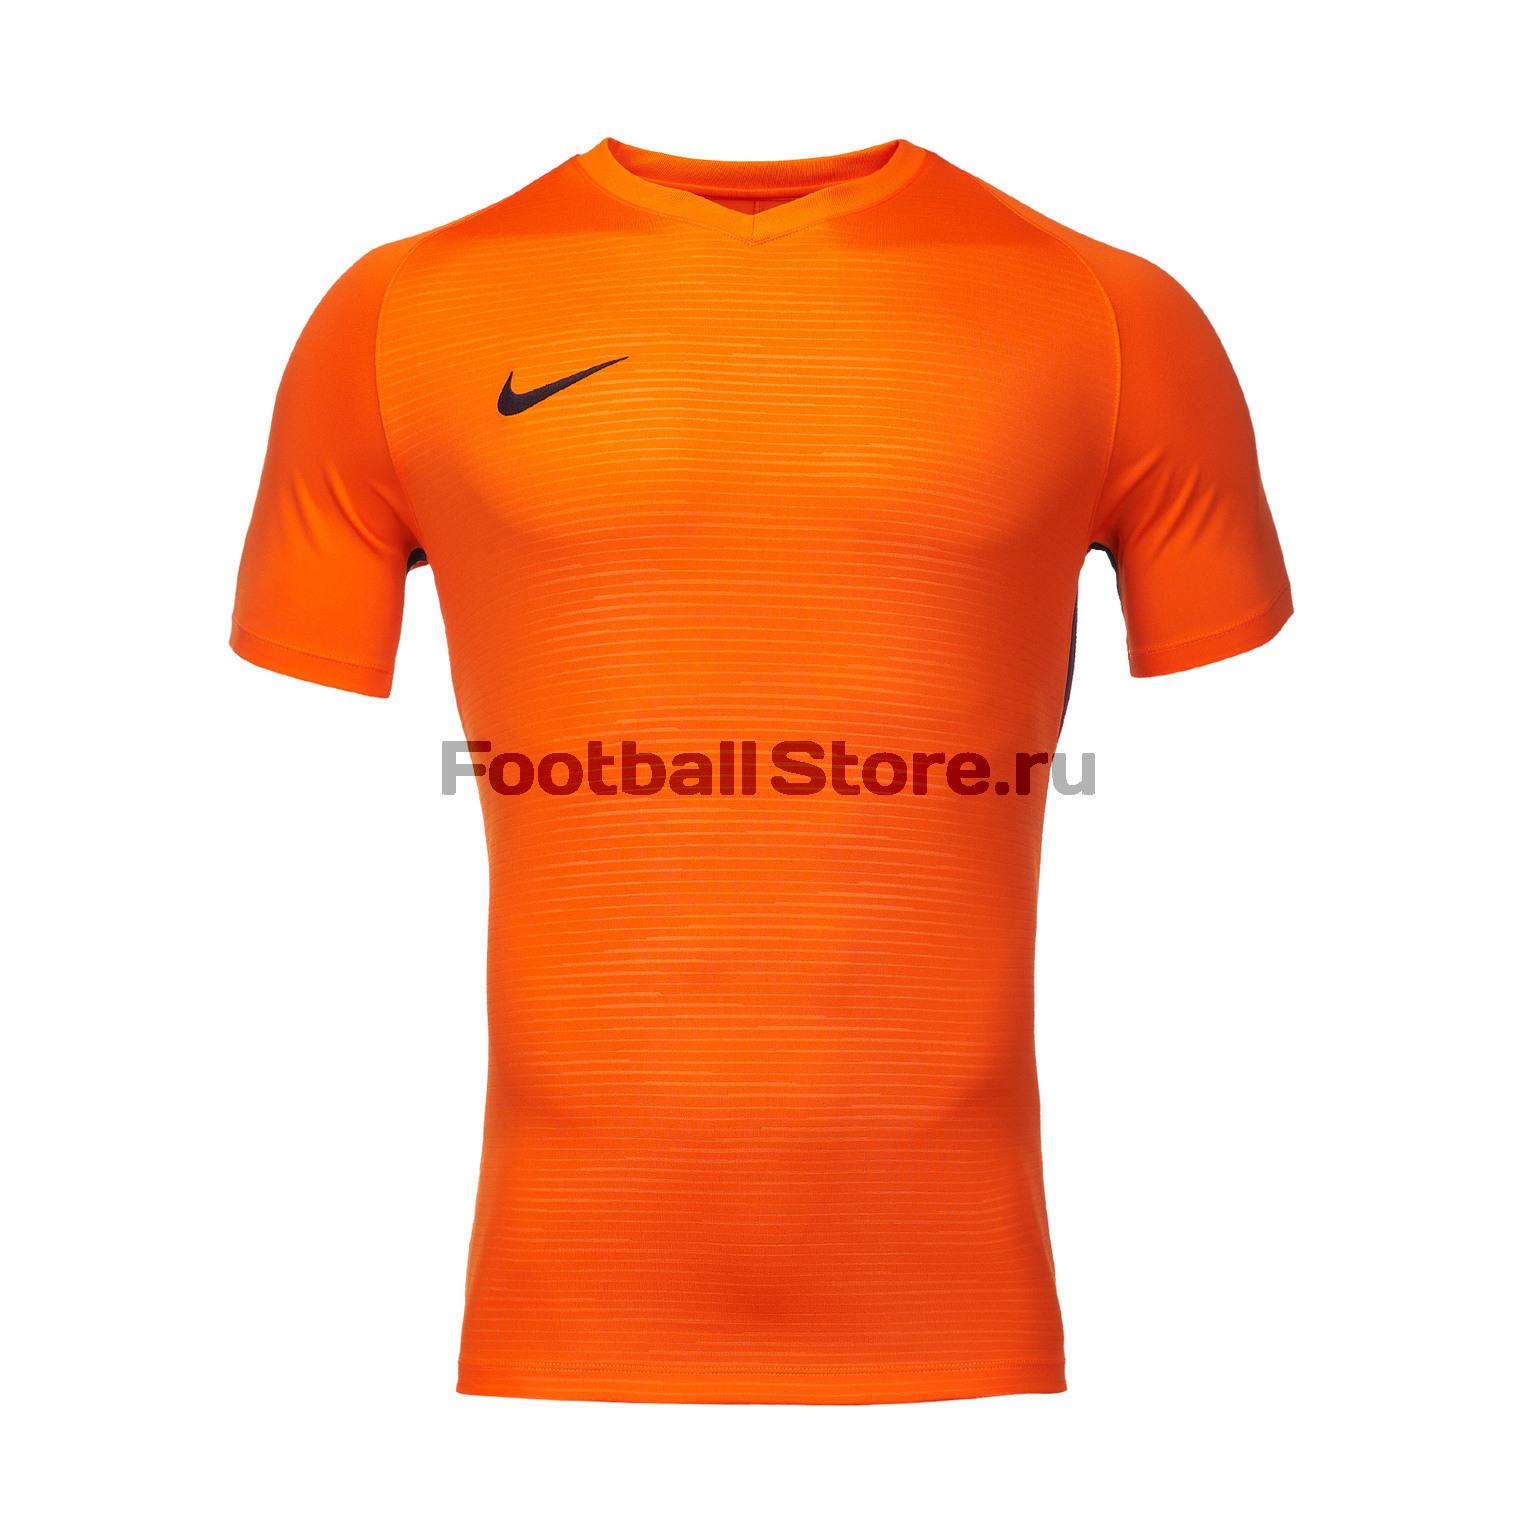 Футболка игровая Nike Dry Tiempo Prem JSY SS 894230-815 nike футболка zenit ss h a stadium jsy